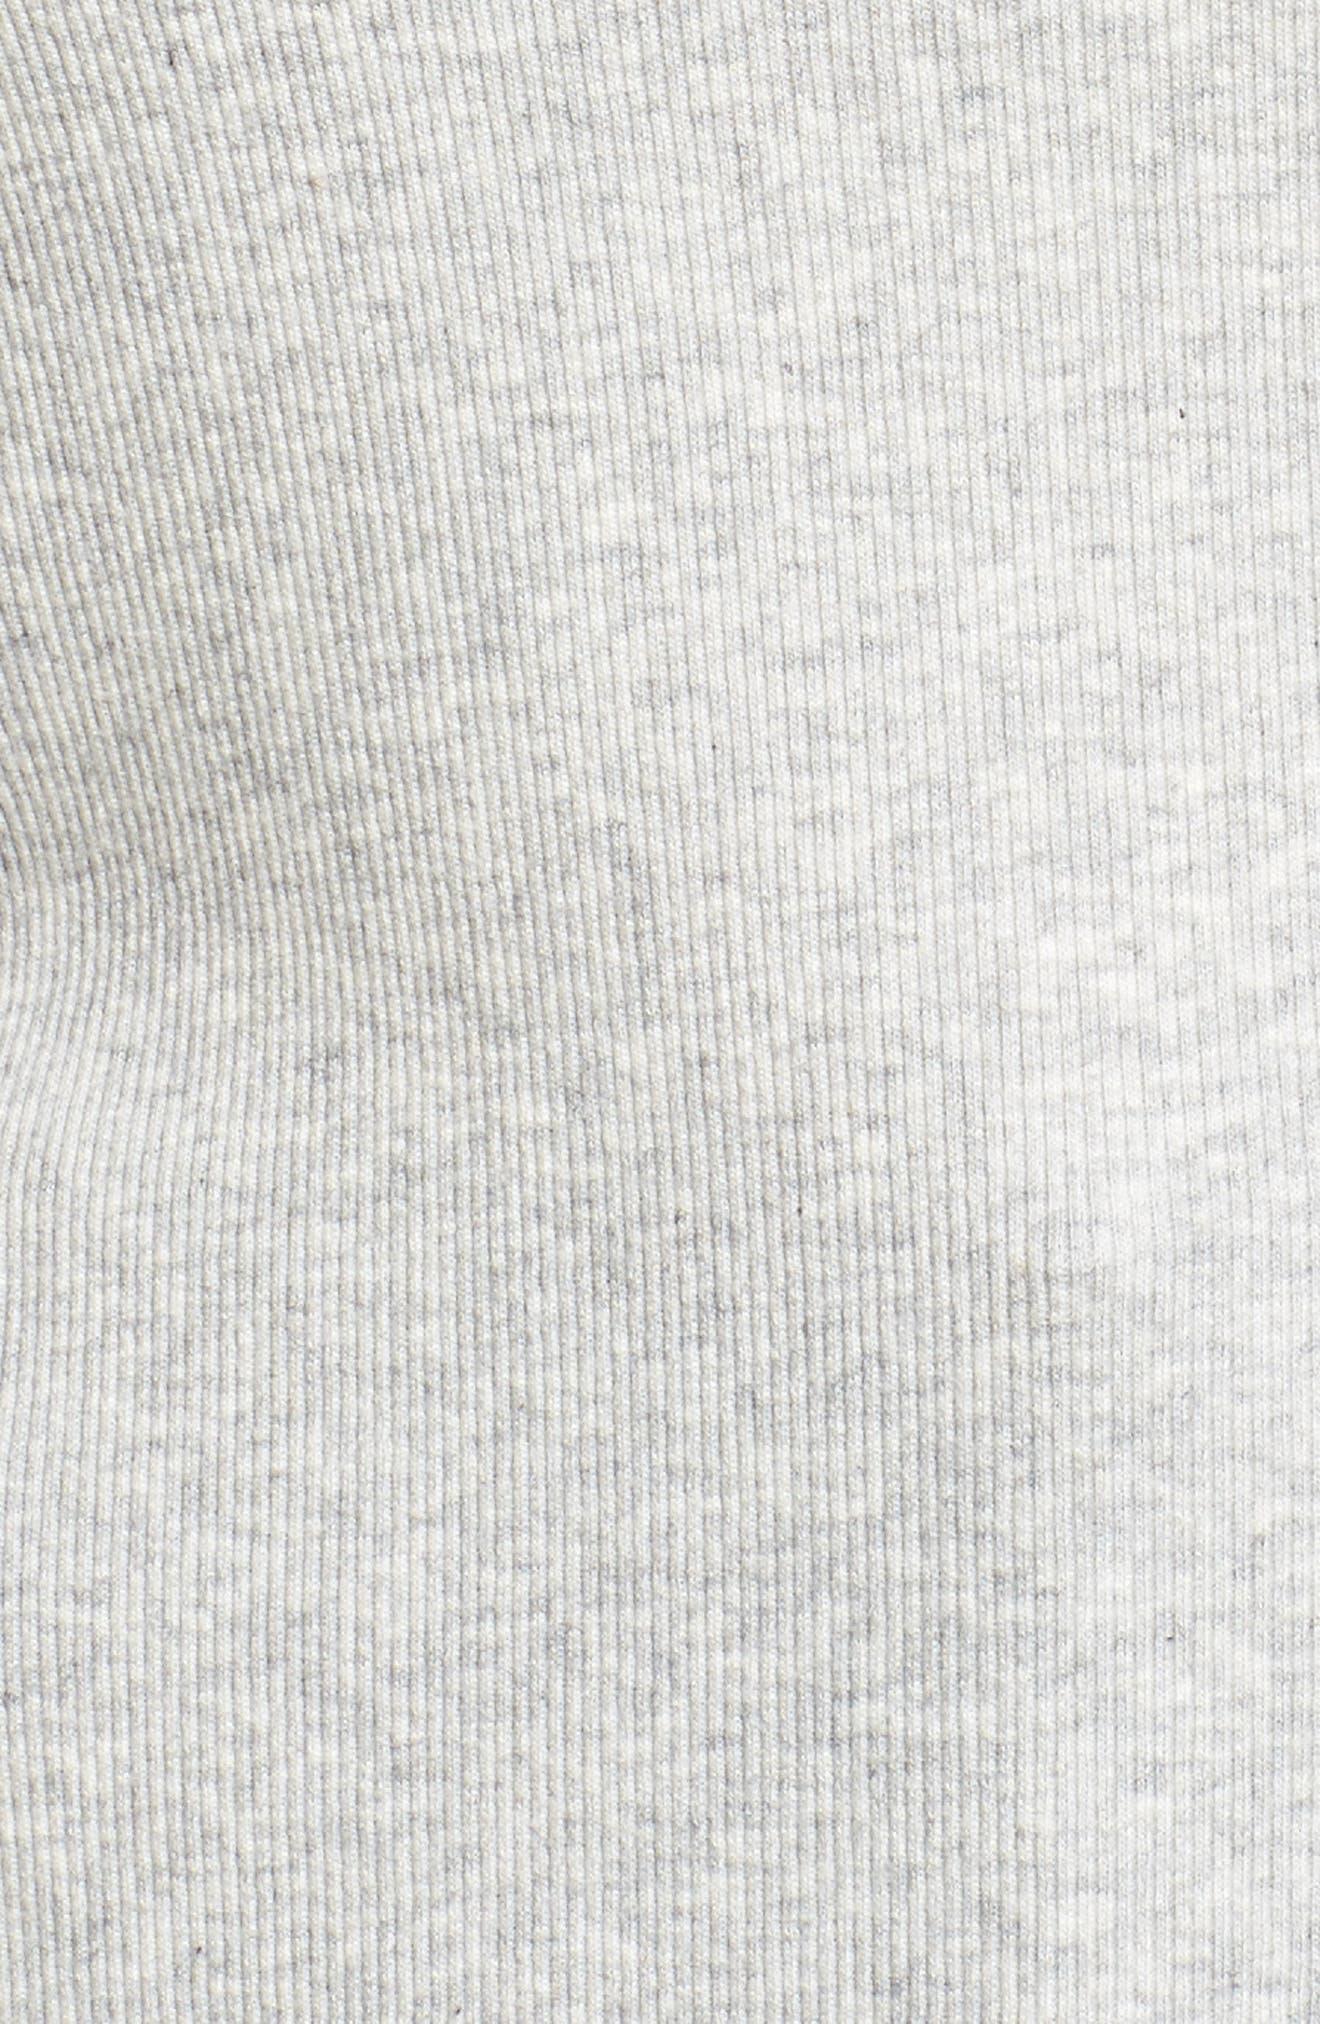 Sleeveless Rib Knit Top,                             Alternate thumbnail 9, color,